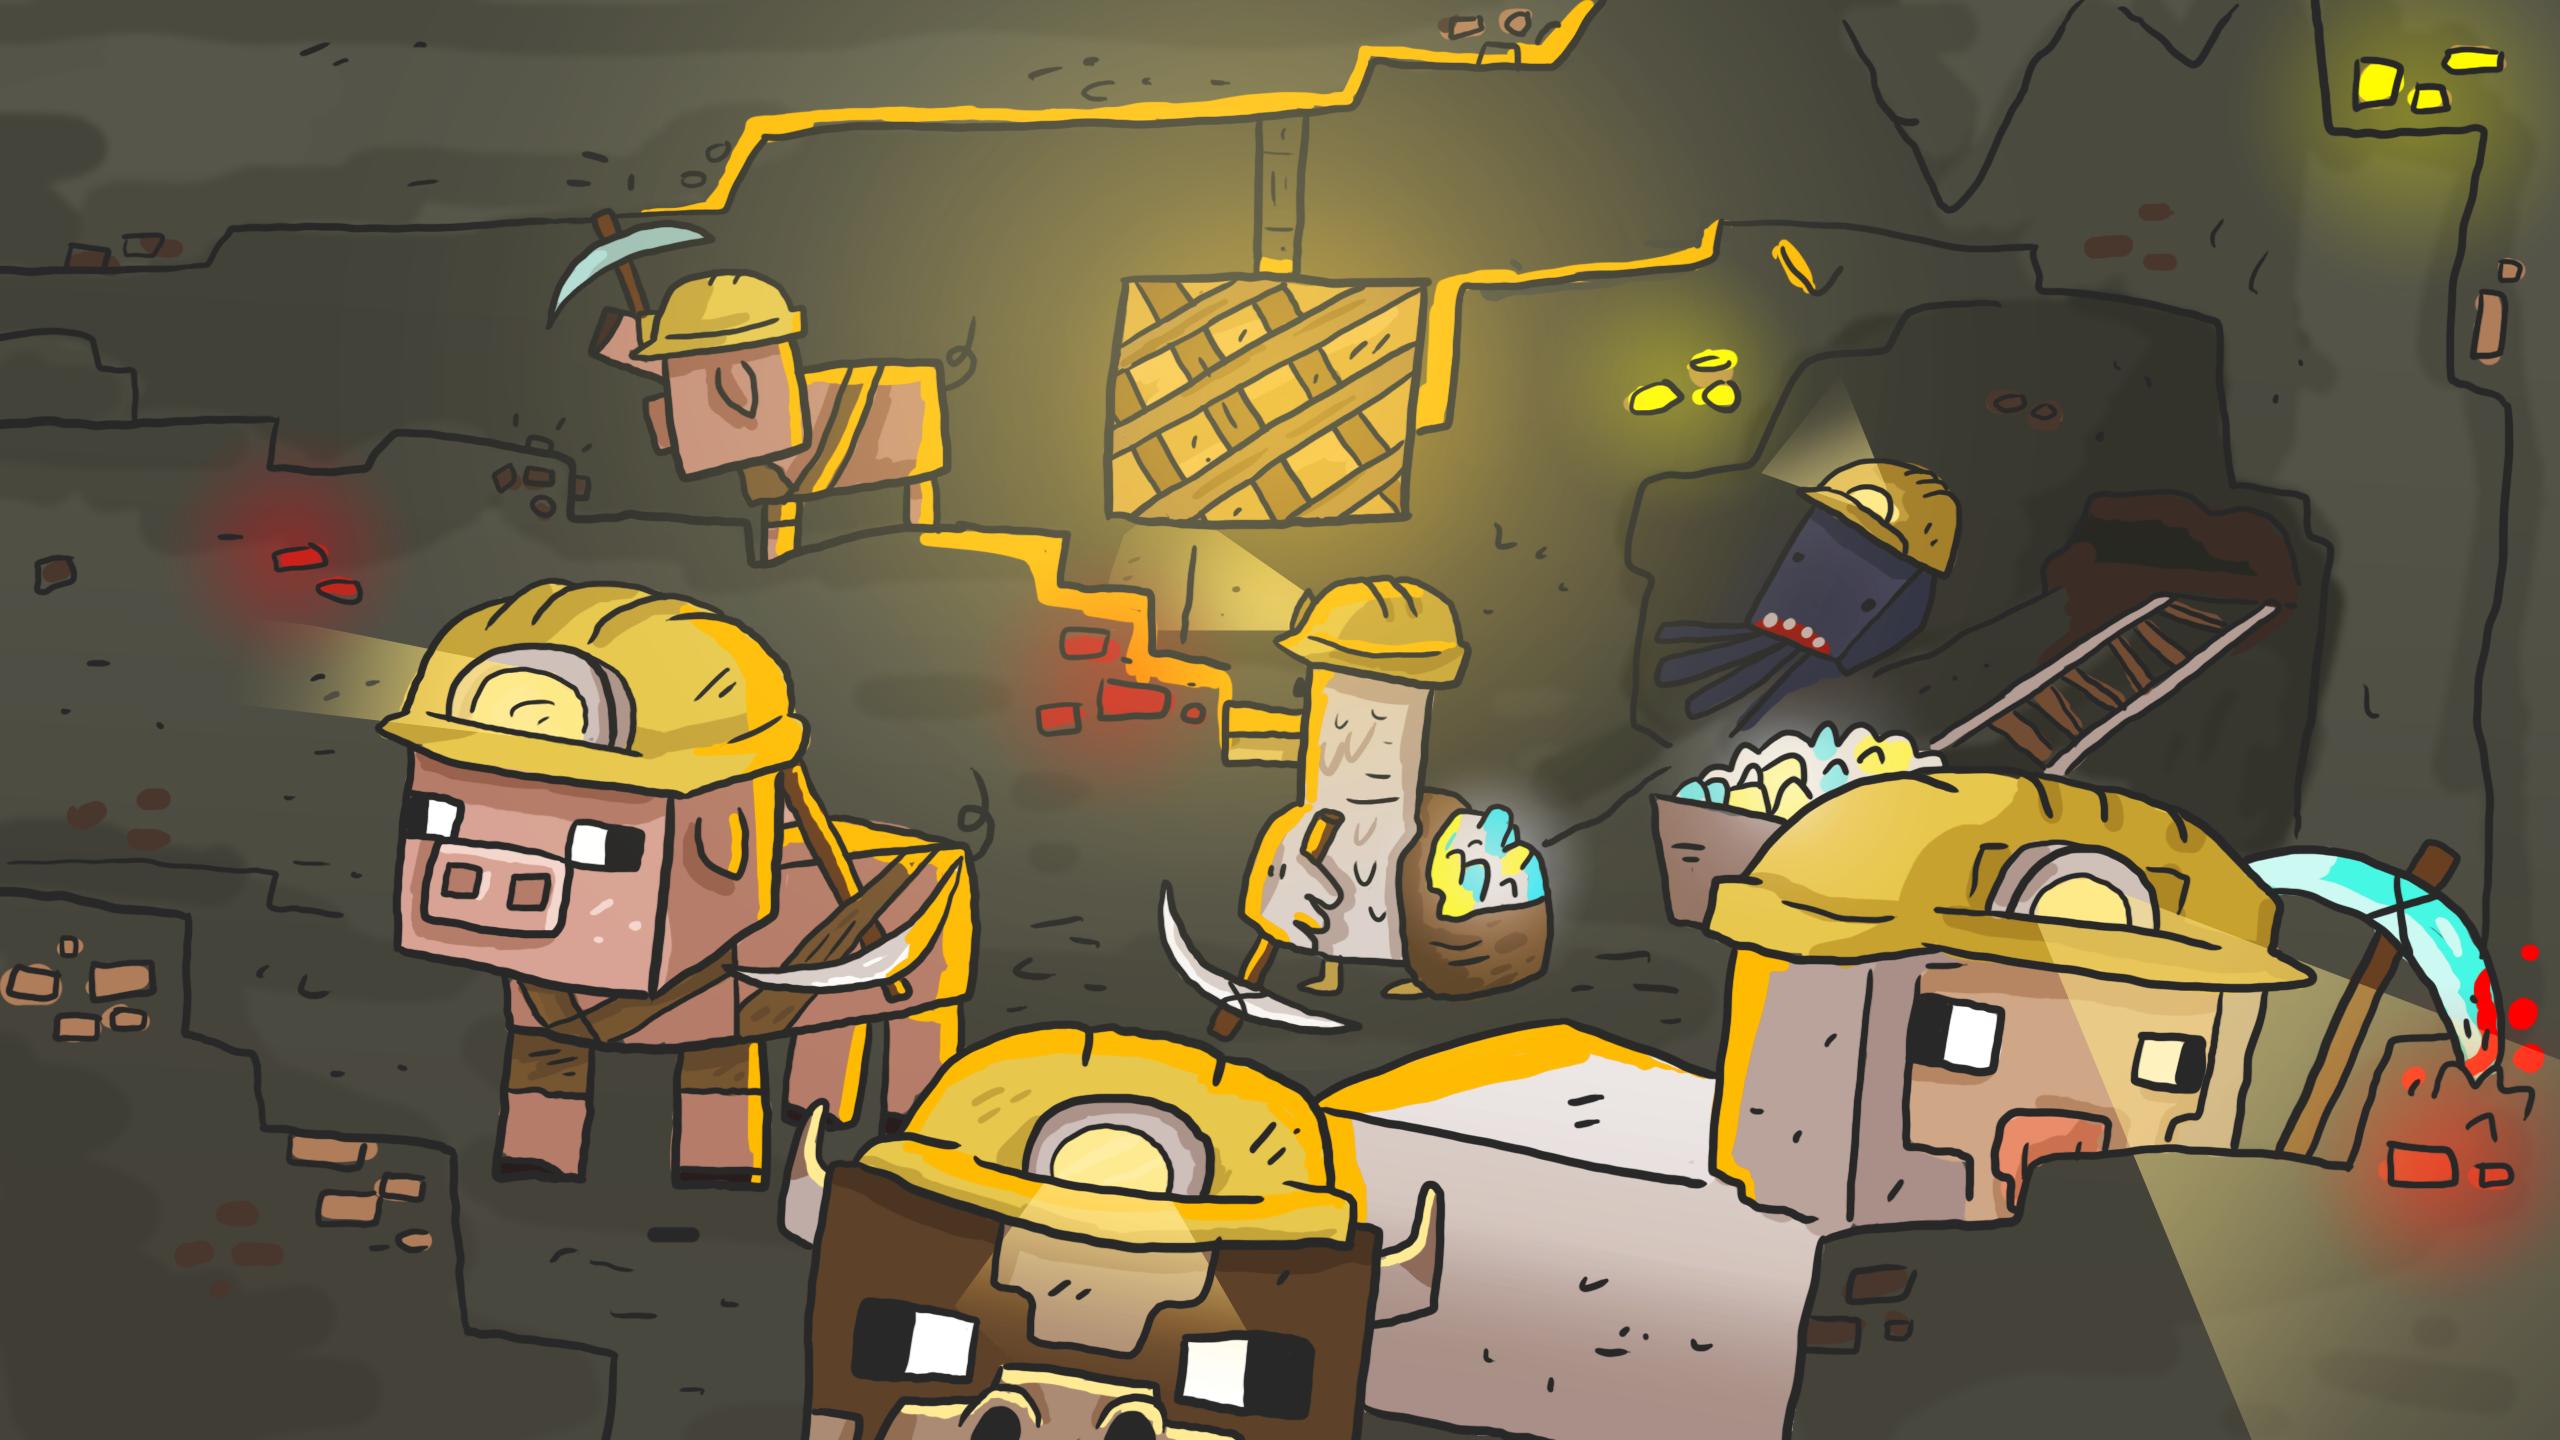 Top 10 Minecraft Wallpapers   MinecraftRocket 2560x1440